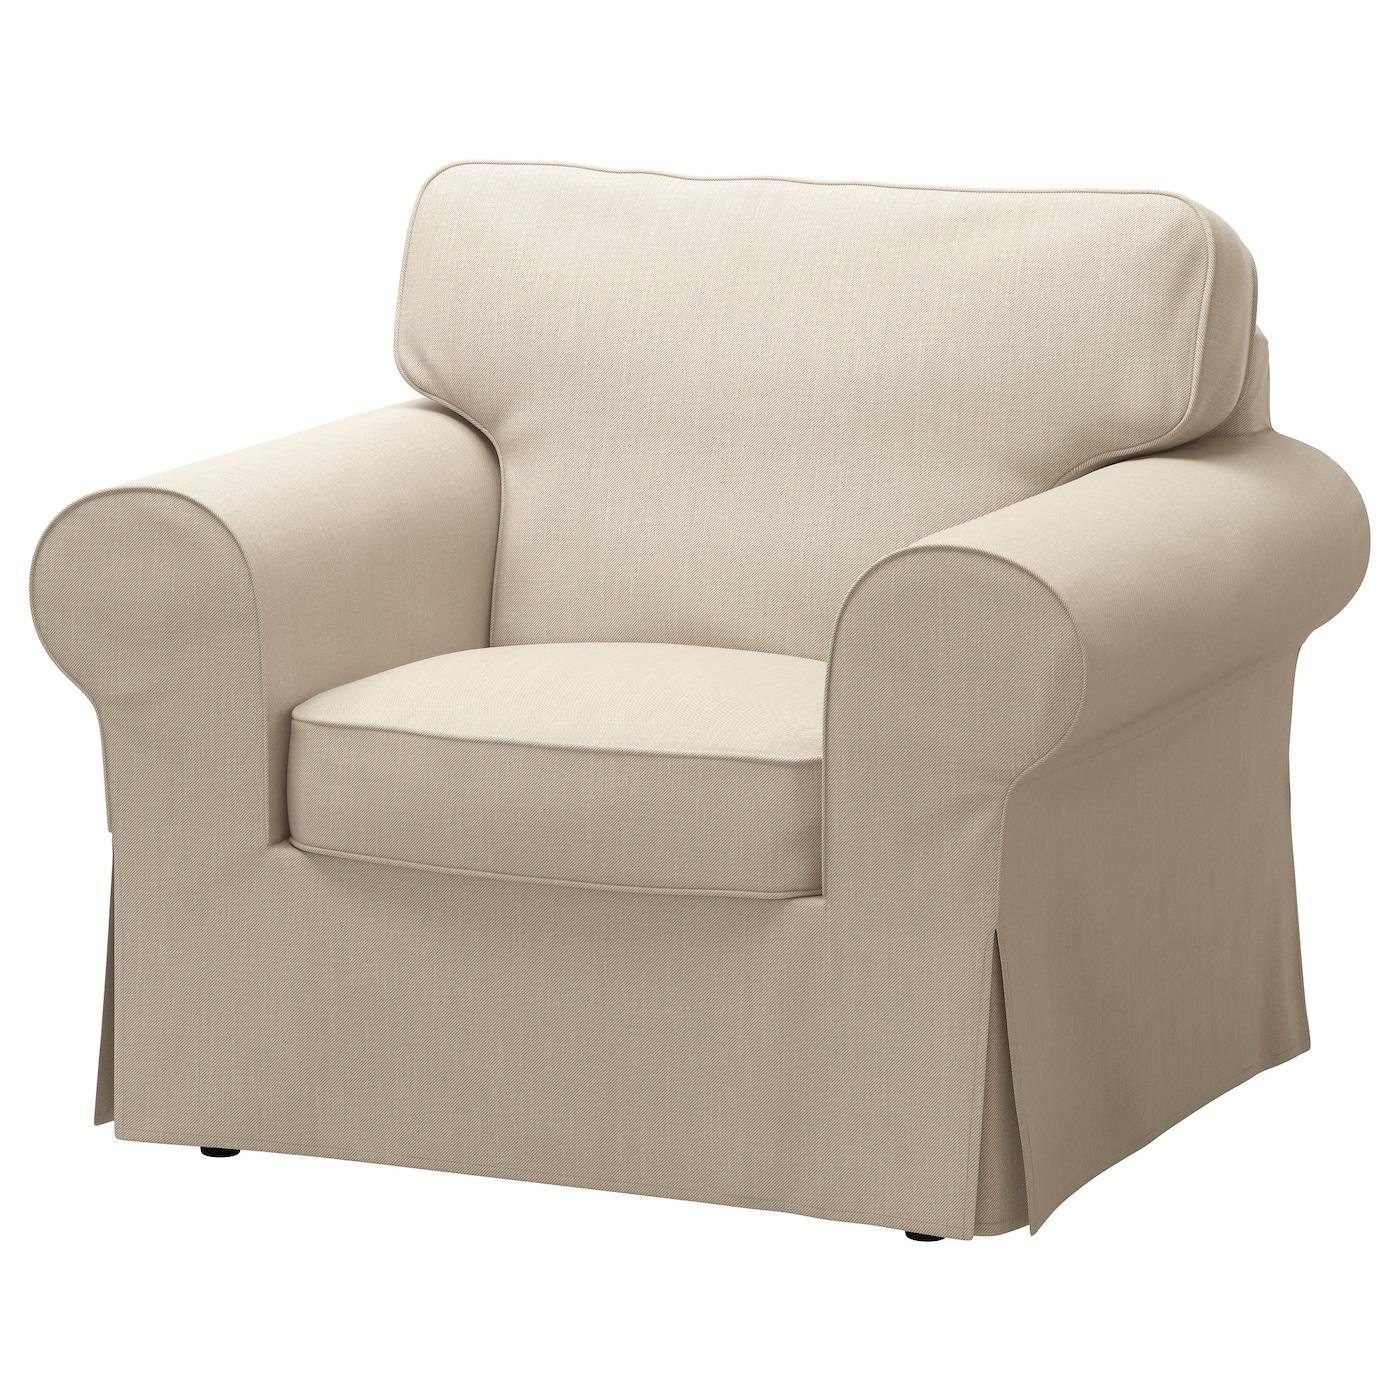 Superb IKEA EKTORP Armchair Cover